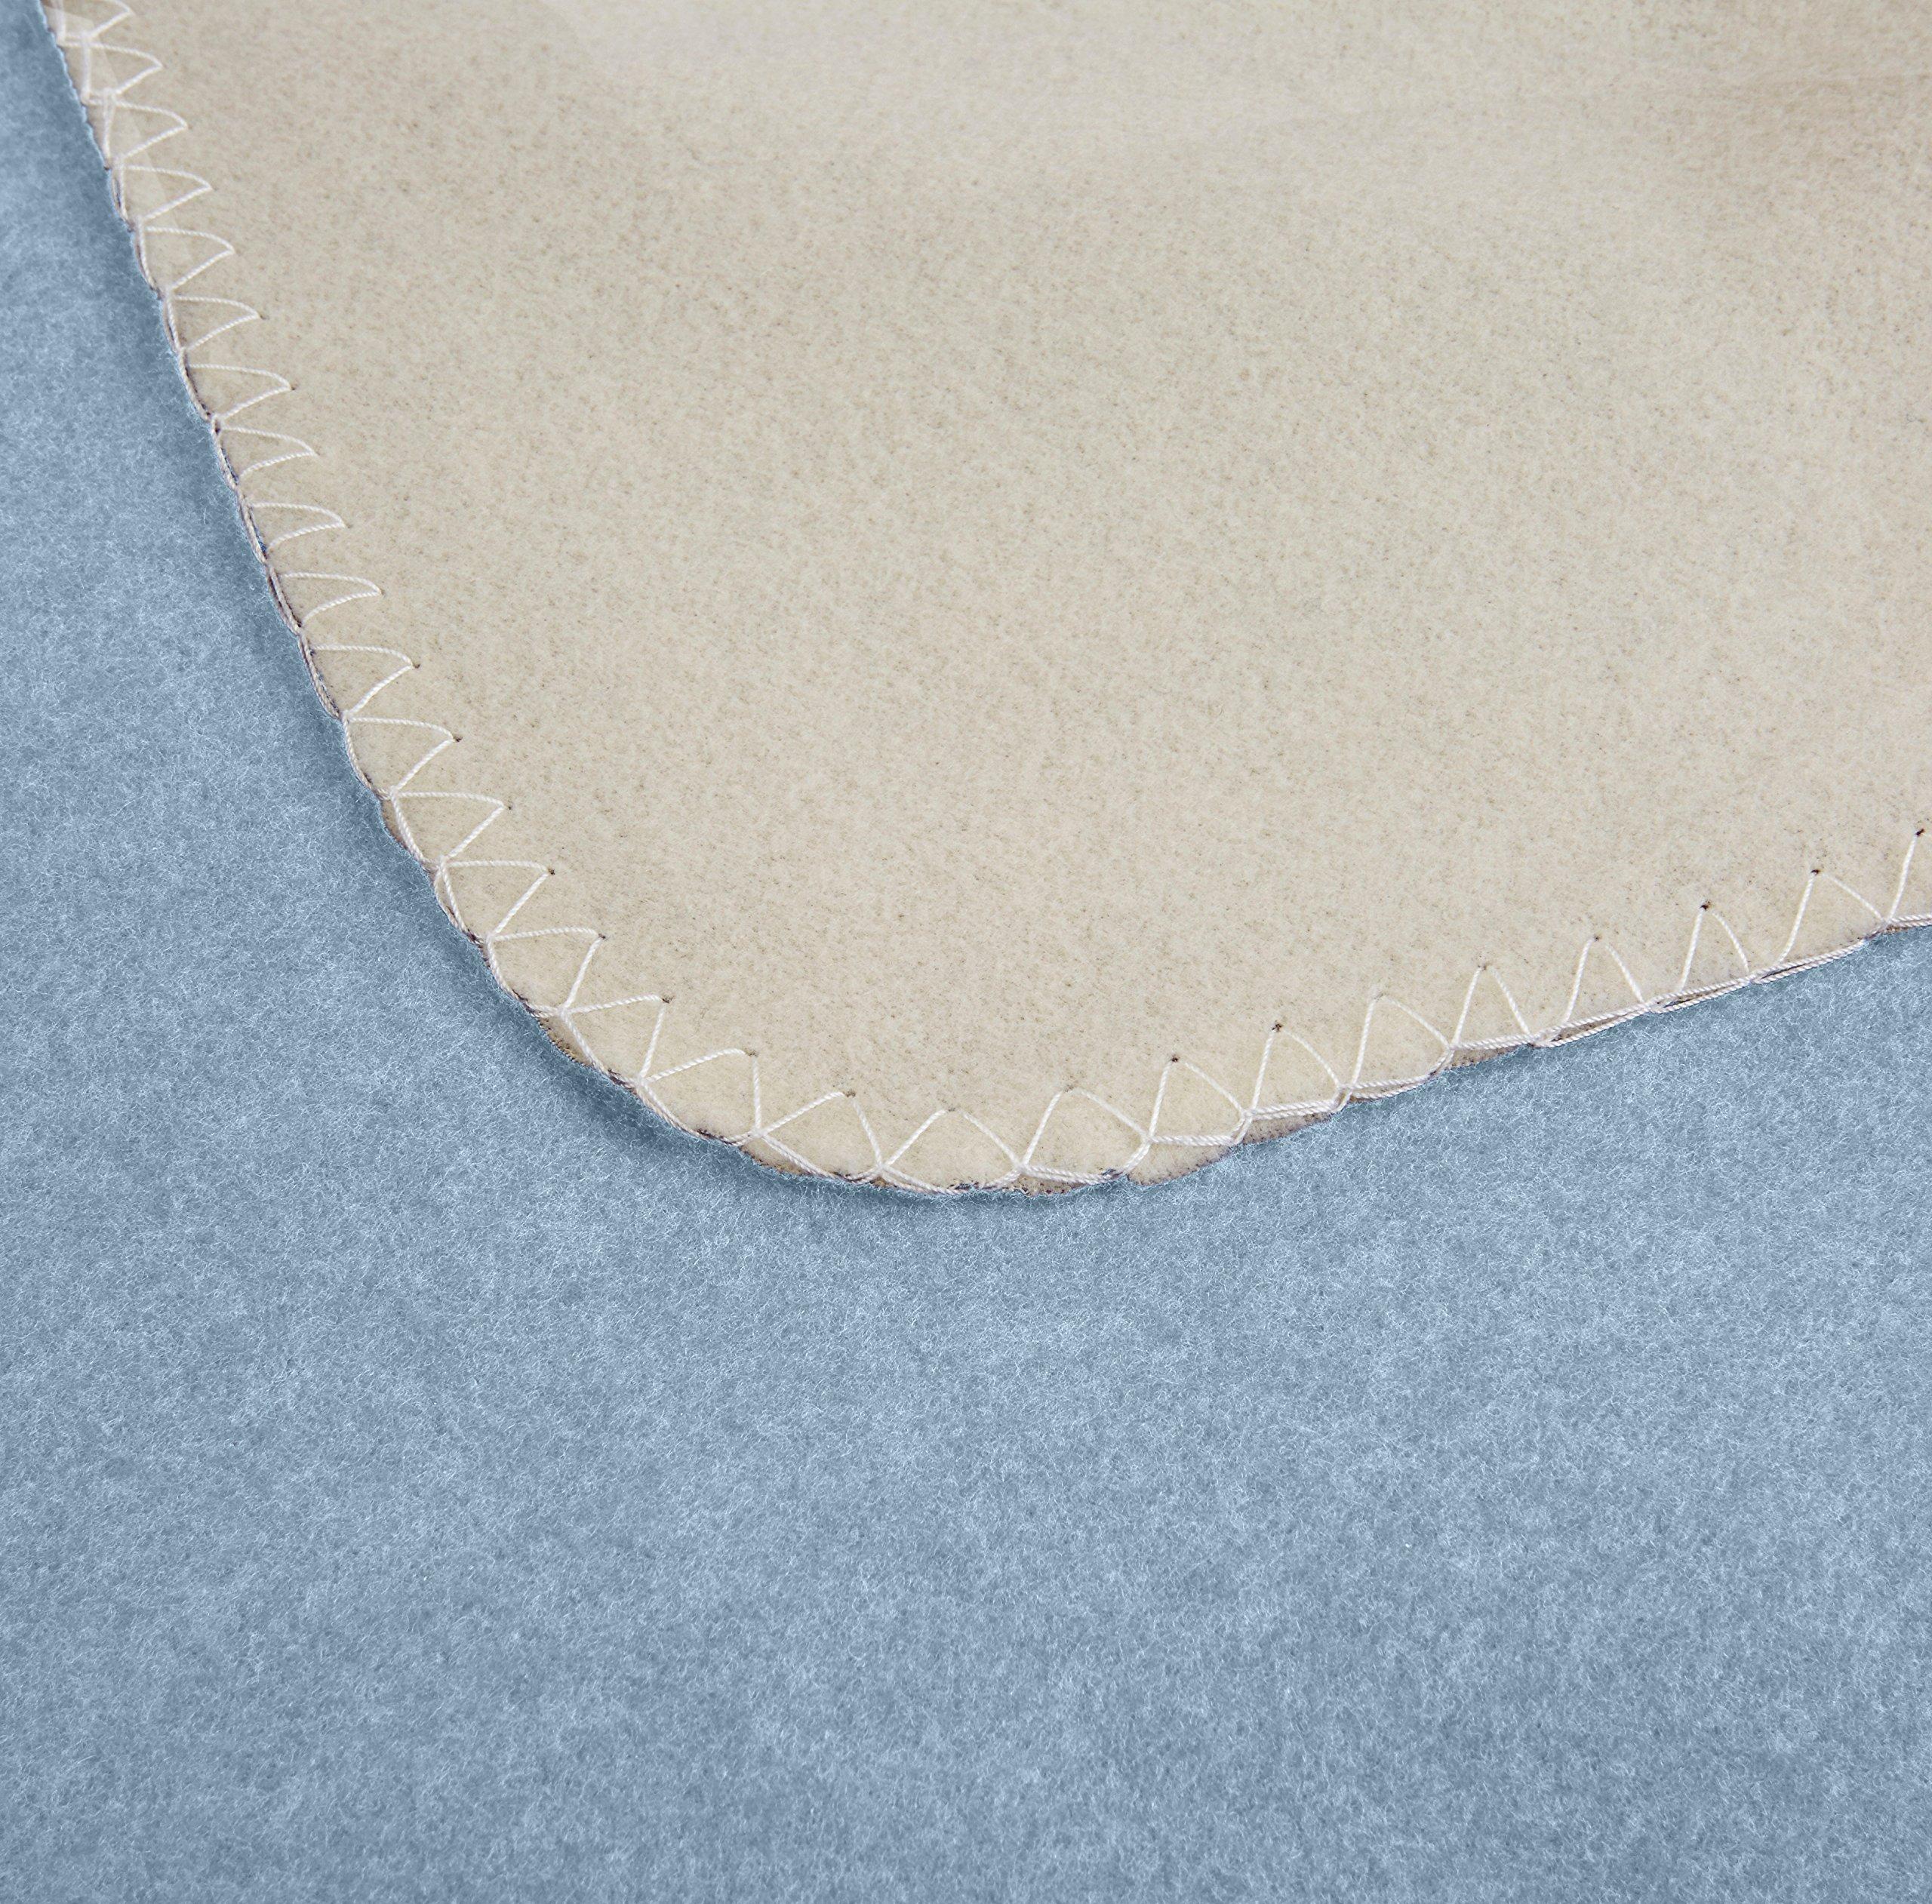 AmazonBasics Reversible Fleece Blanket - Throw, Spa Blue/Taupe by AmazonBasics (Image #4)